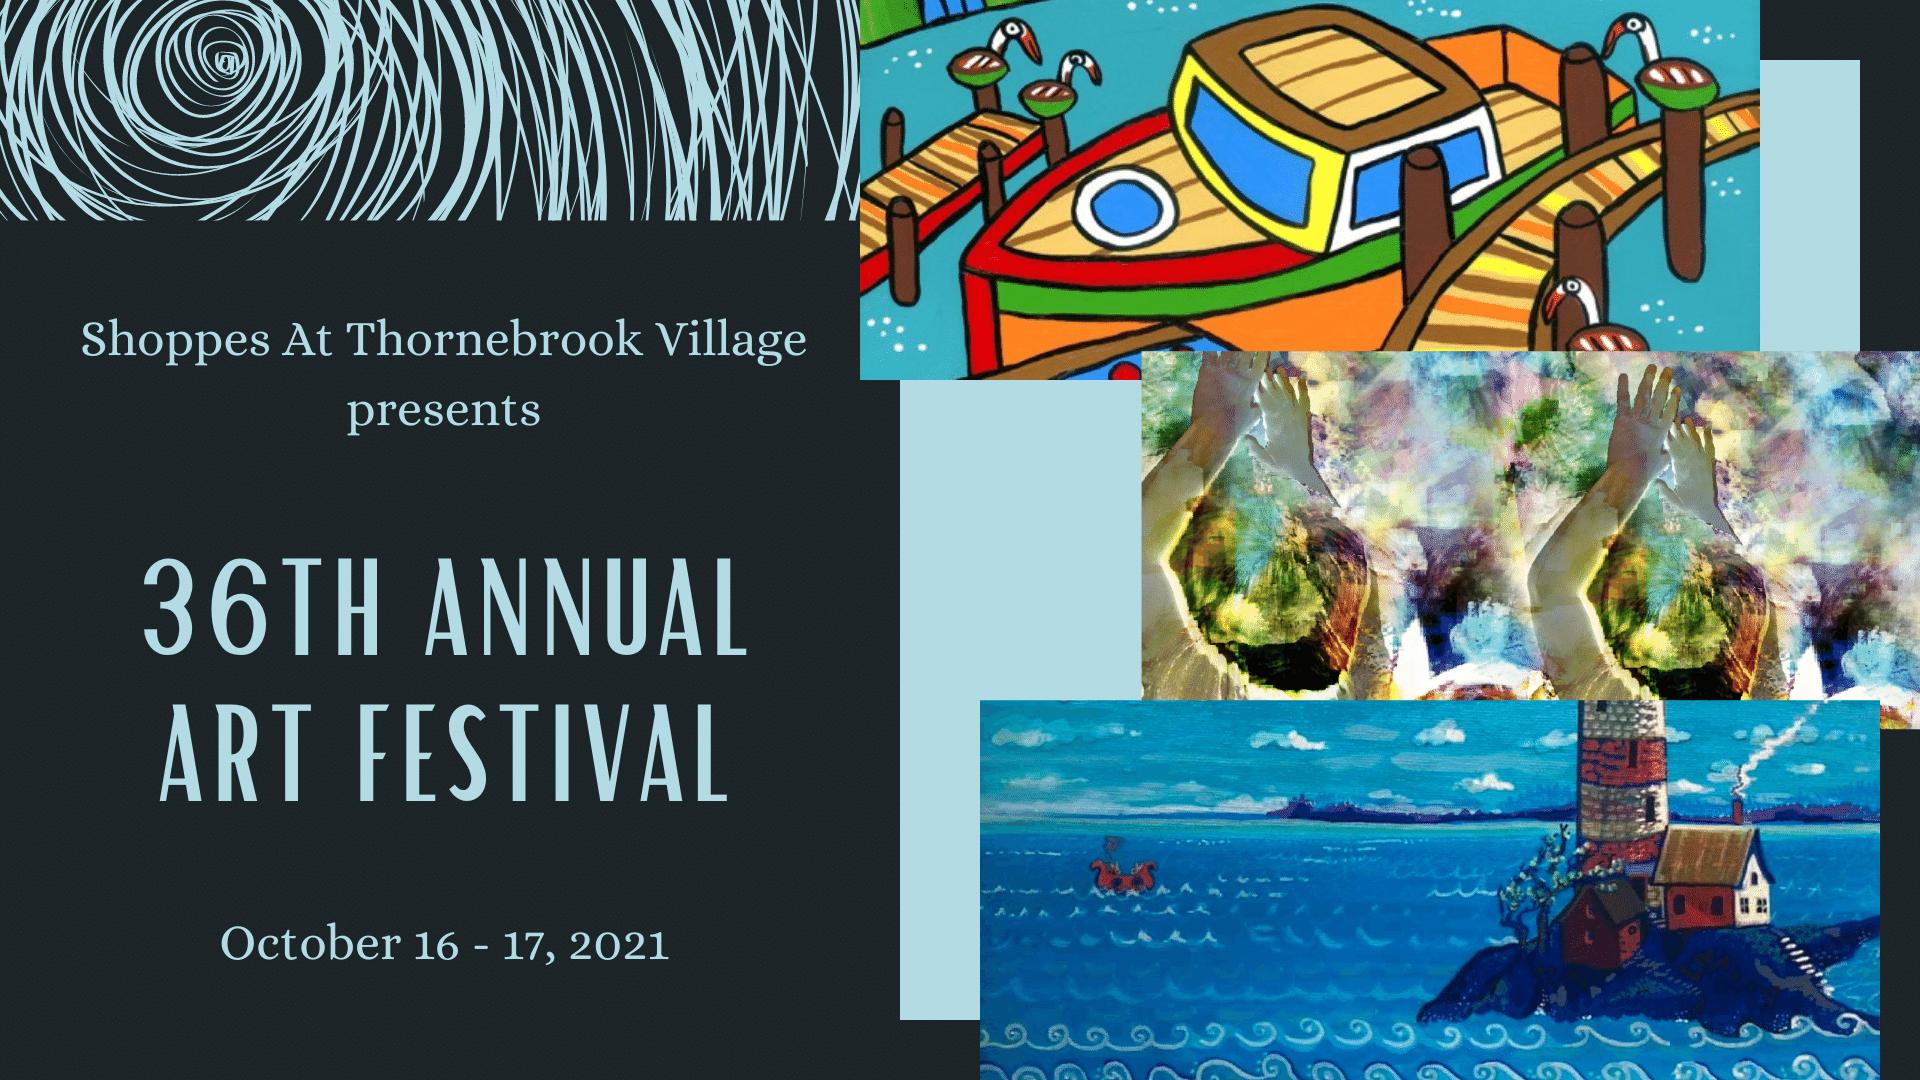 36th Annual Art Festival at Thornebrook